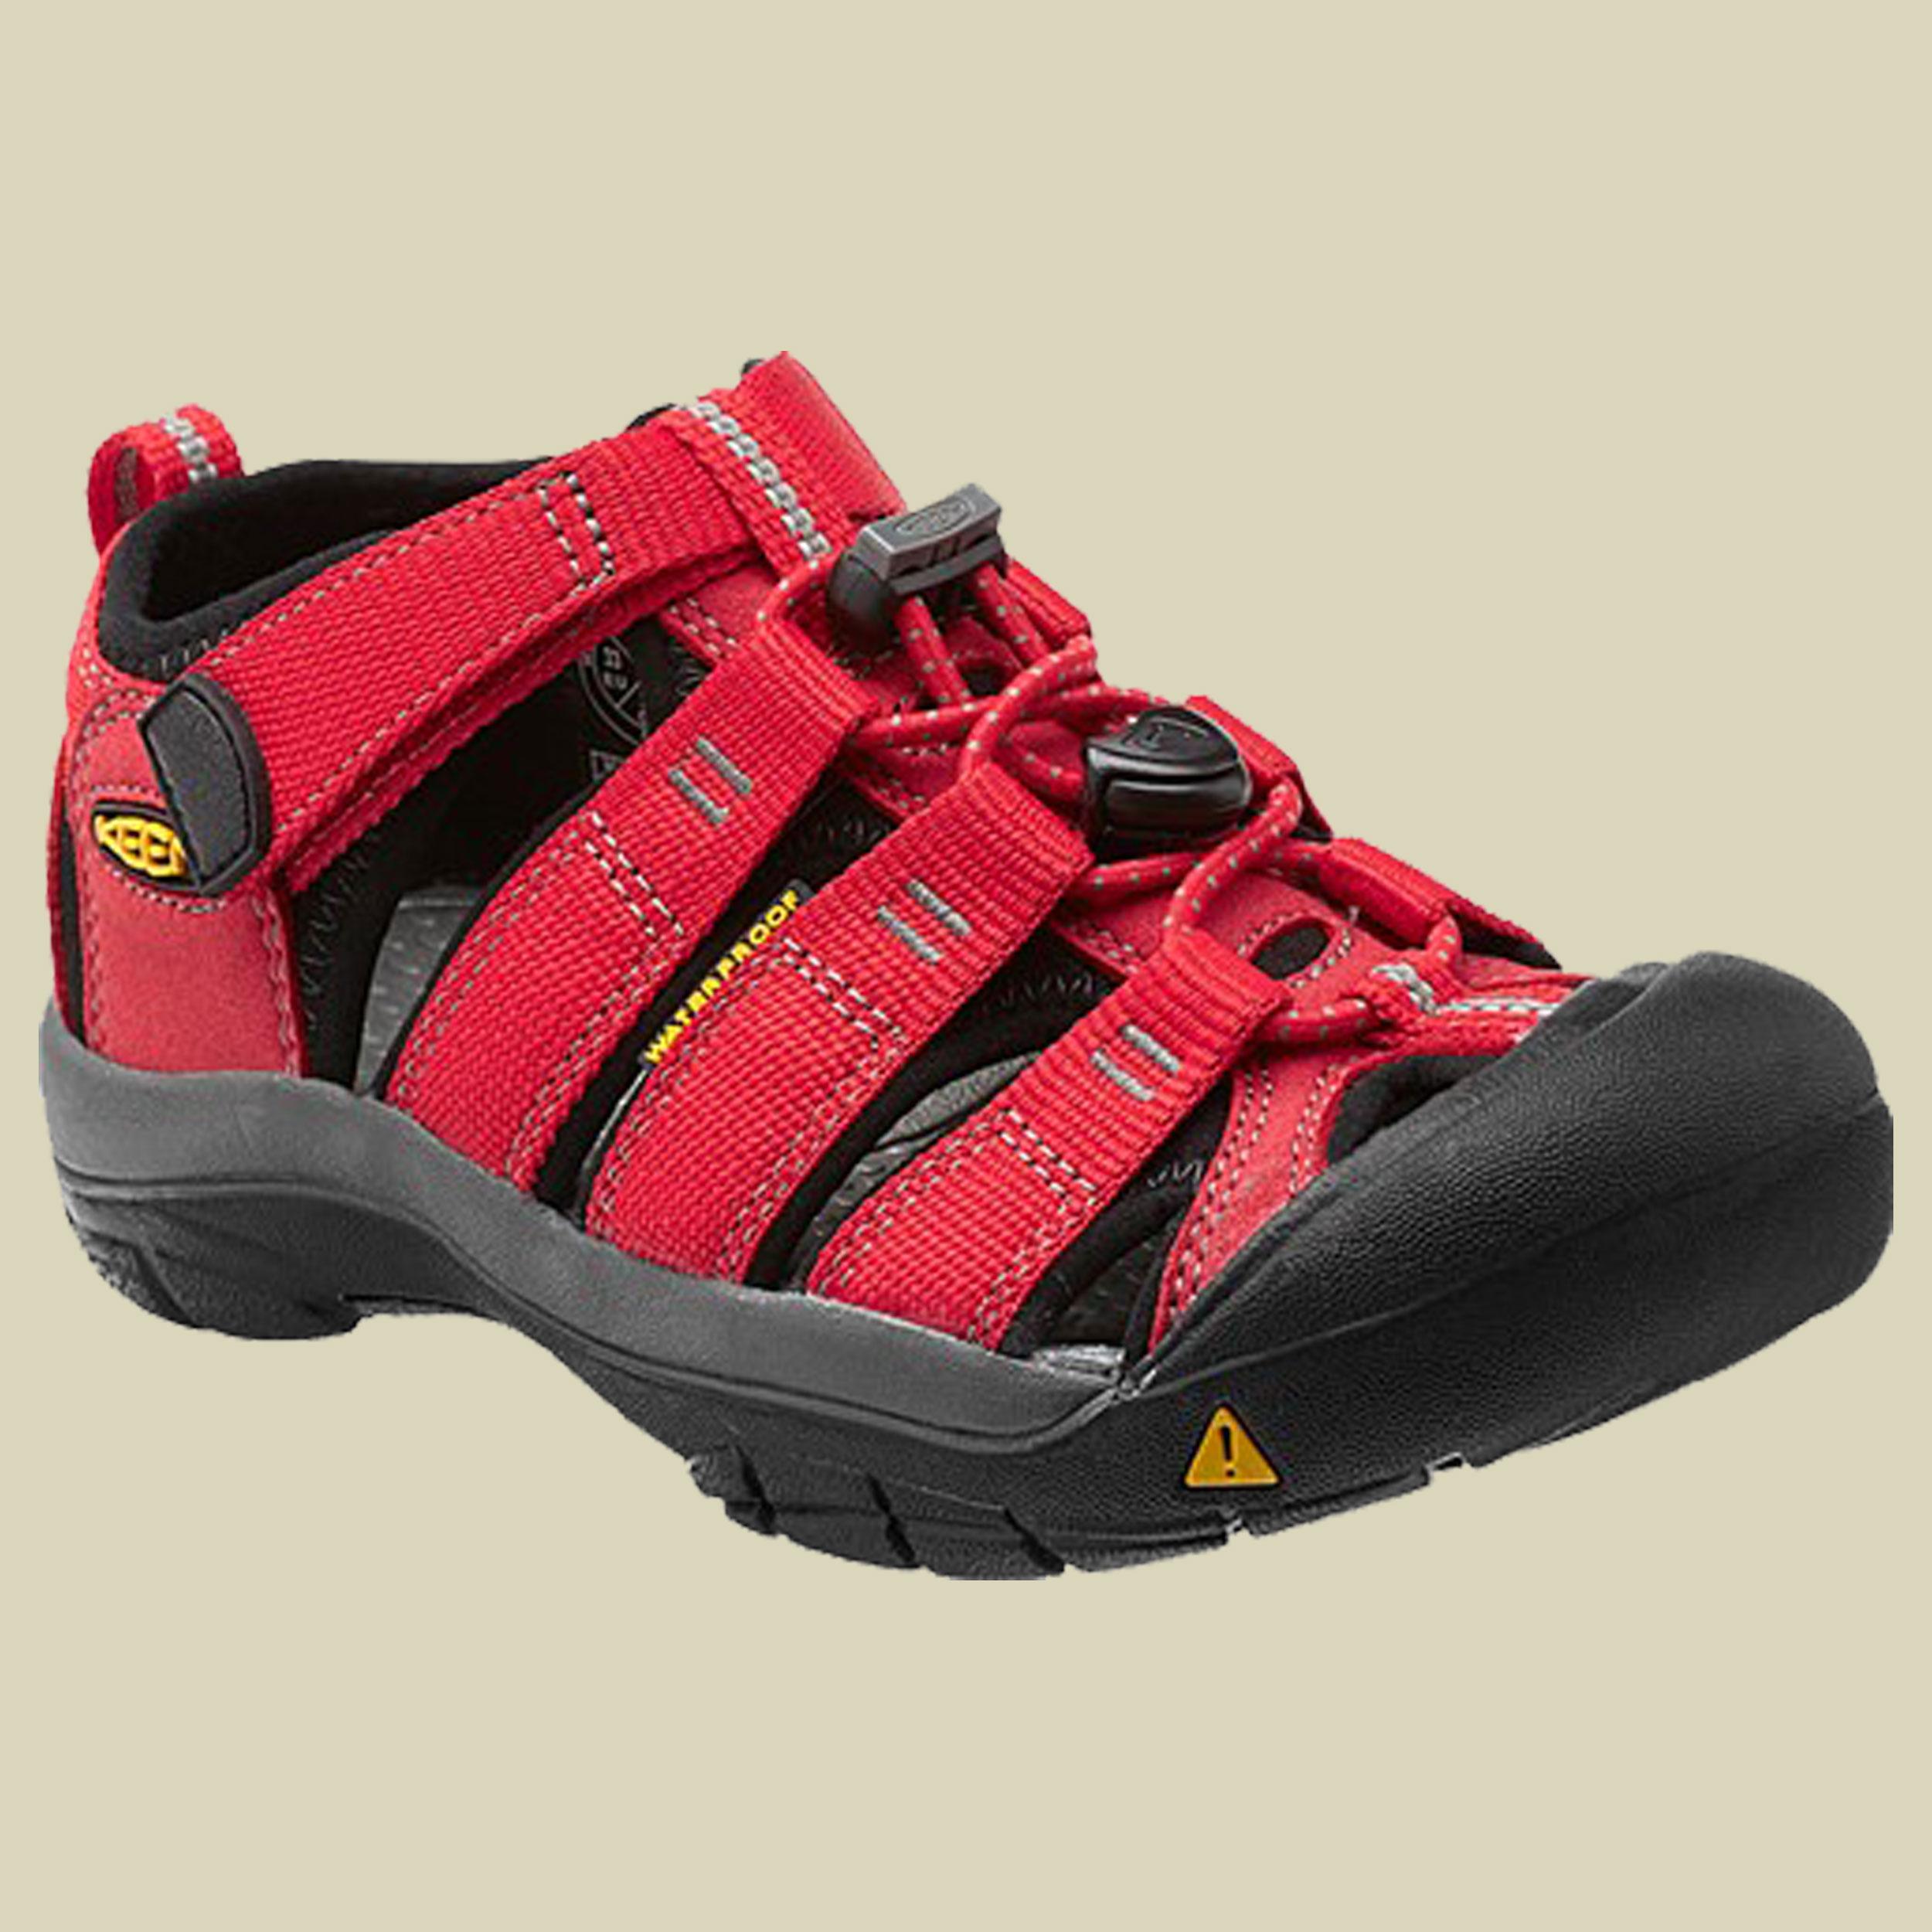 Keen Newport H2 Kids Trekking Sandale Kinder Größe 30 ribbon red-gargoyle